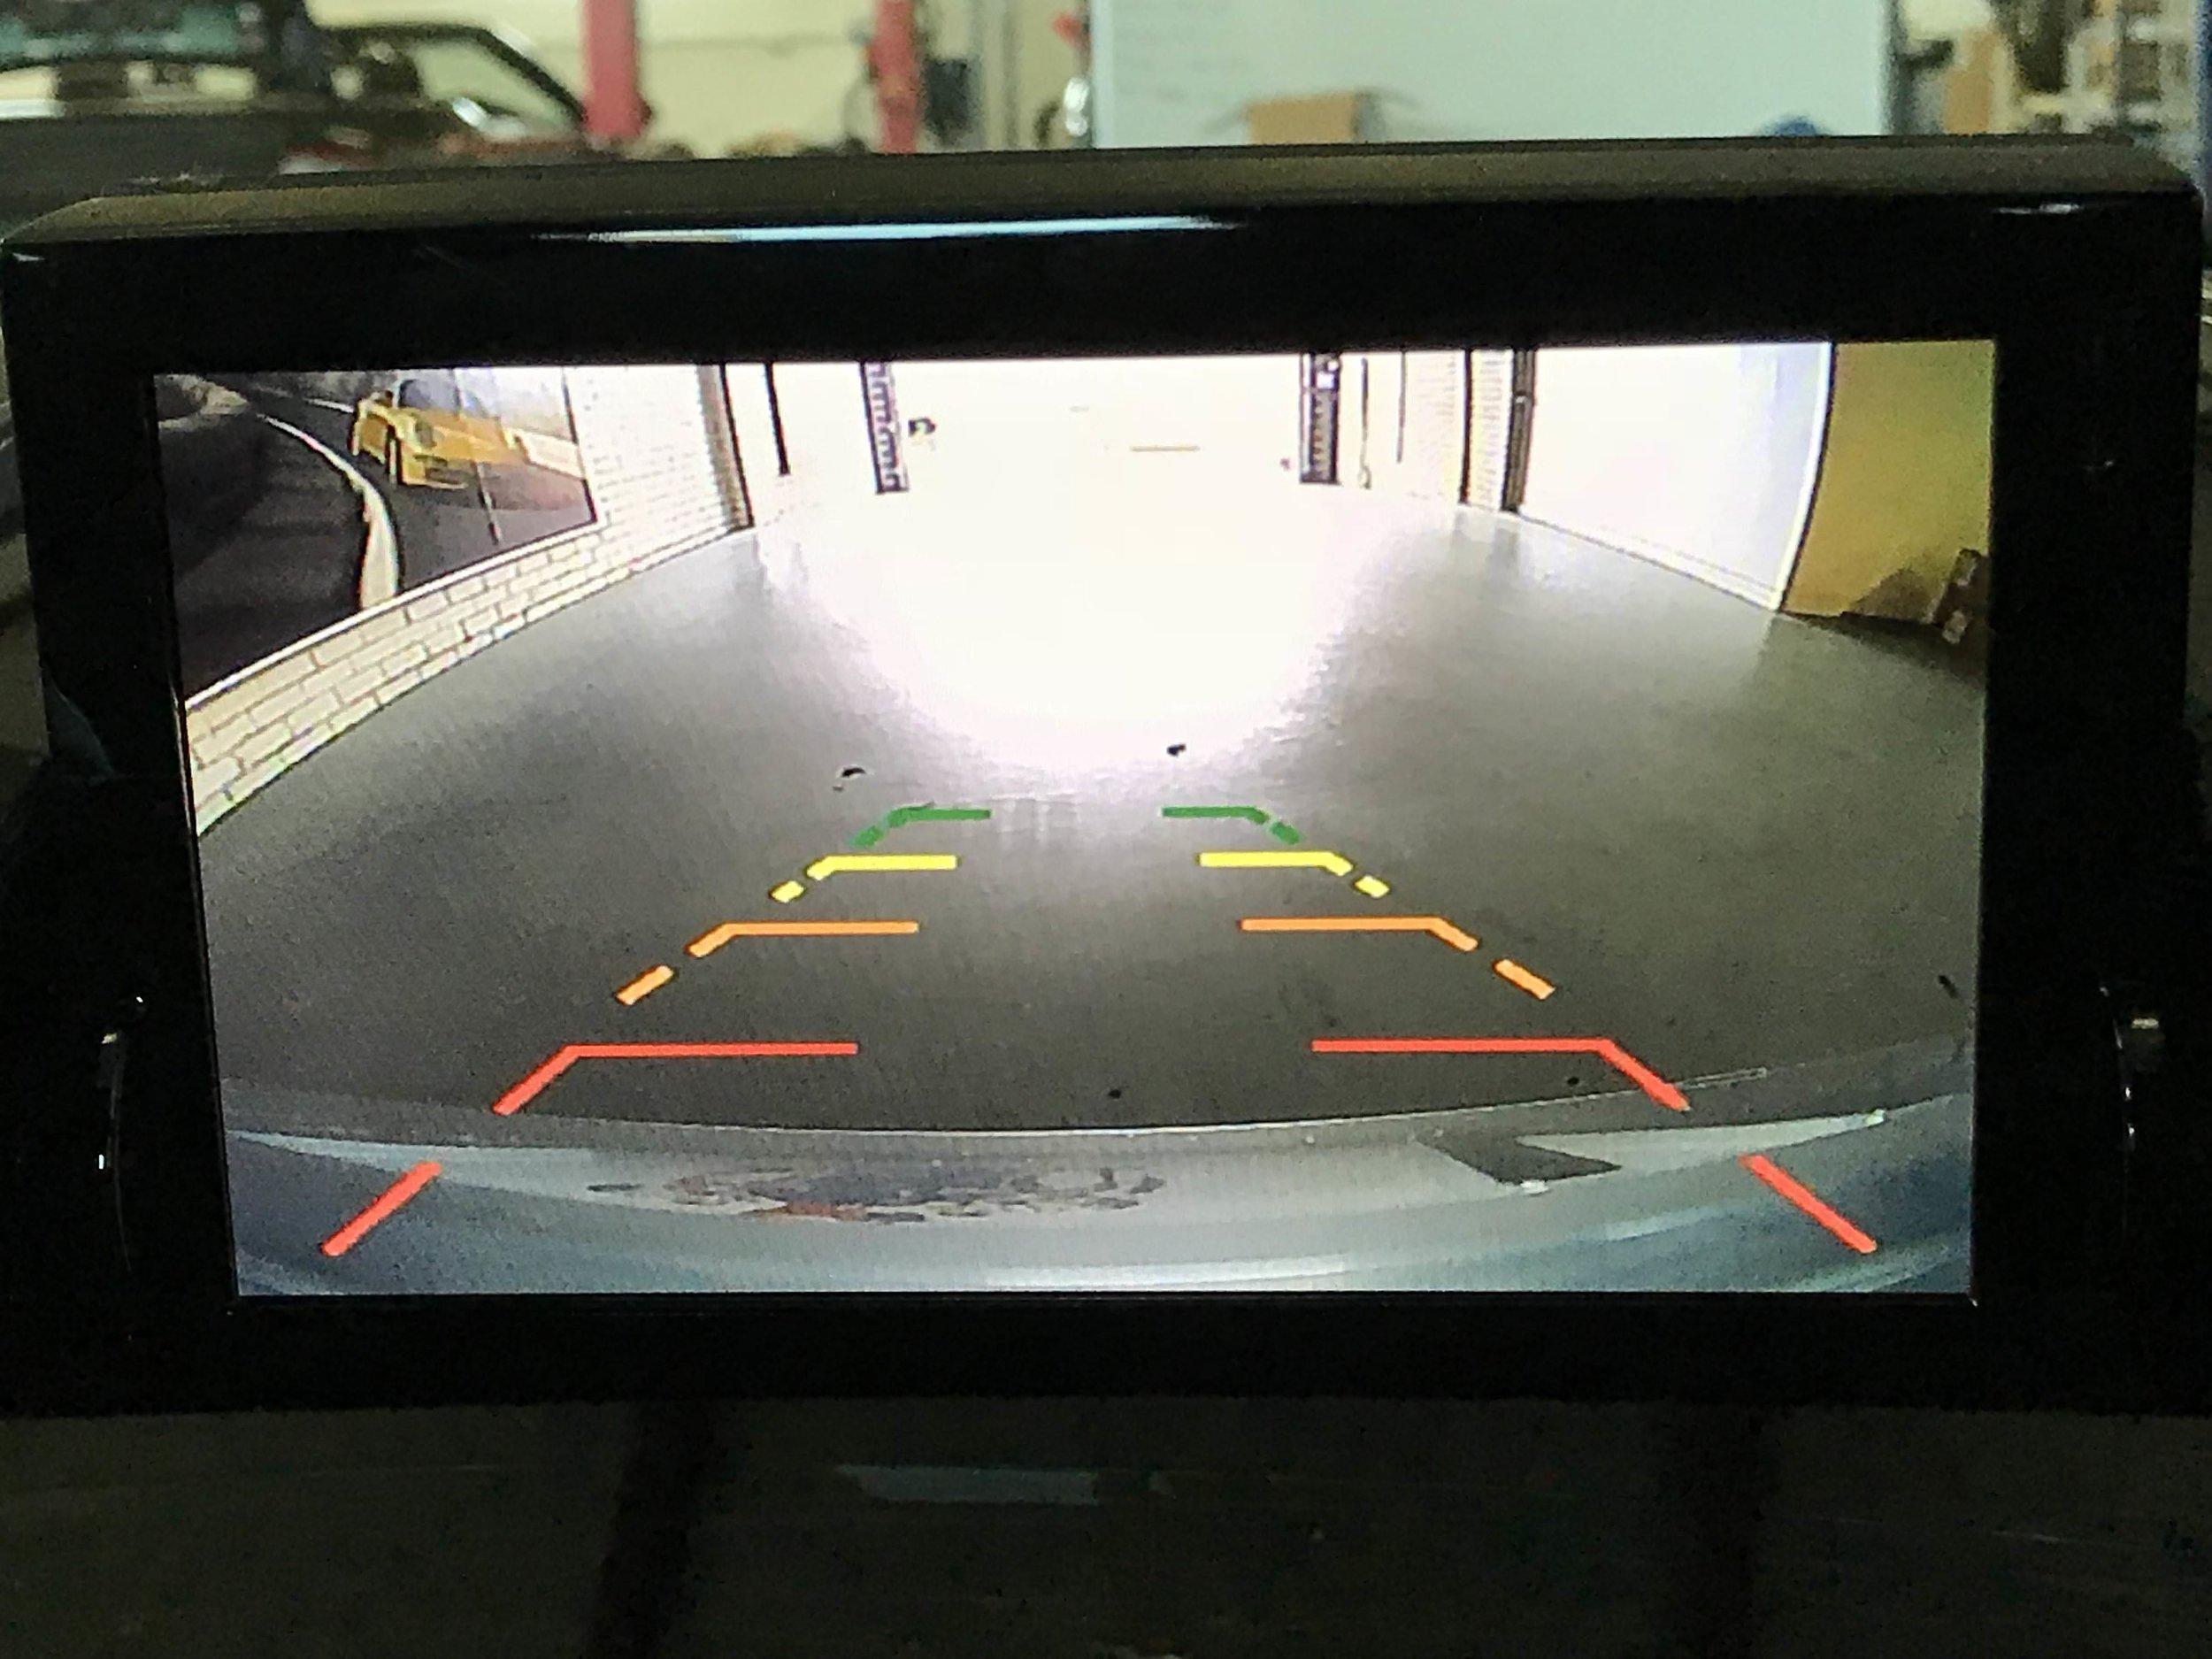 Rear camera image